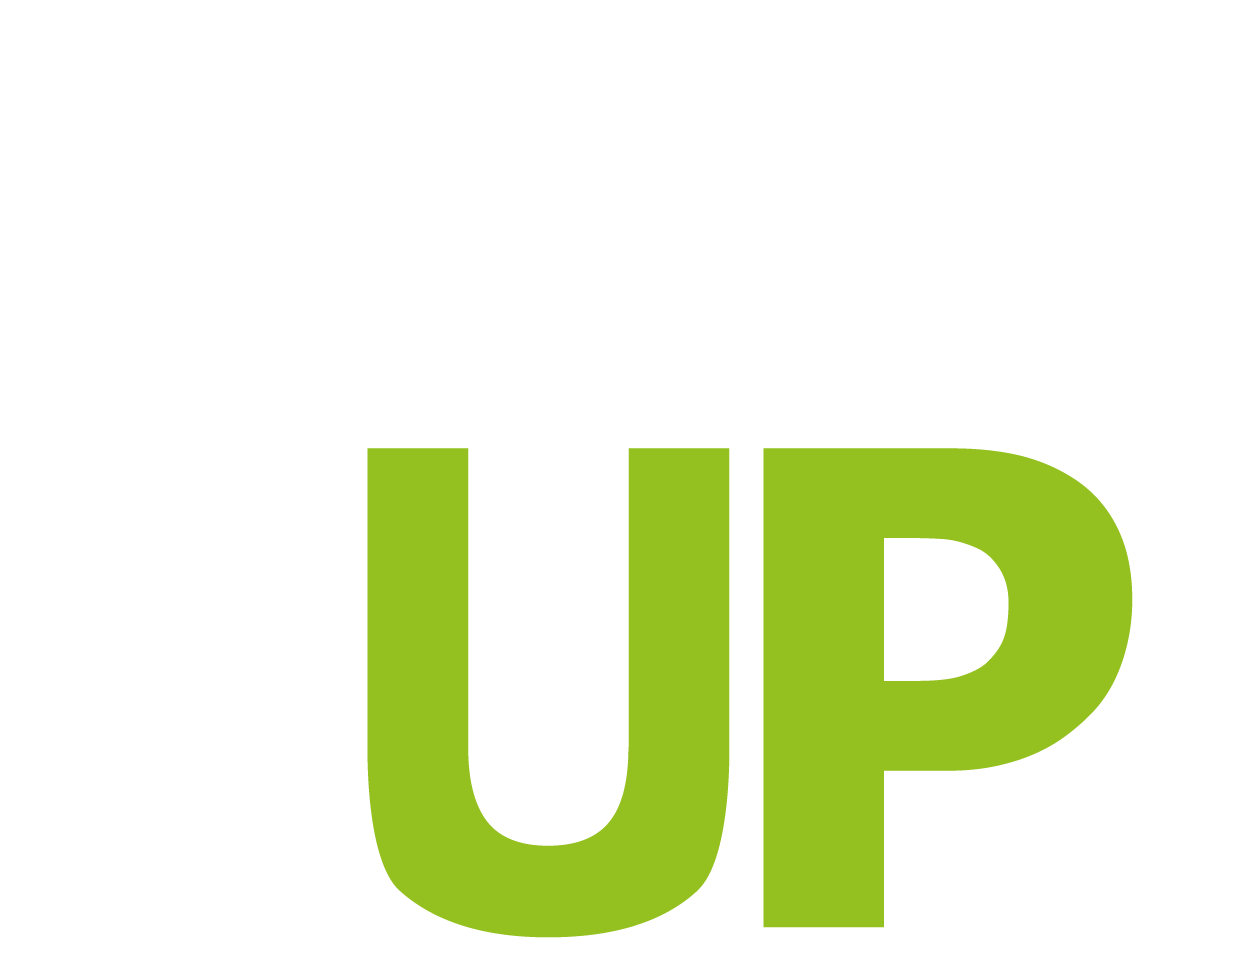 Logo step up def 01